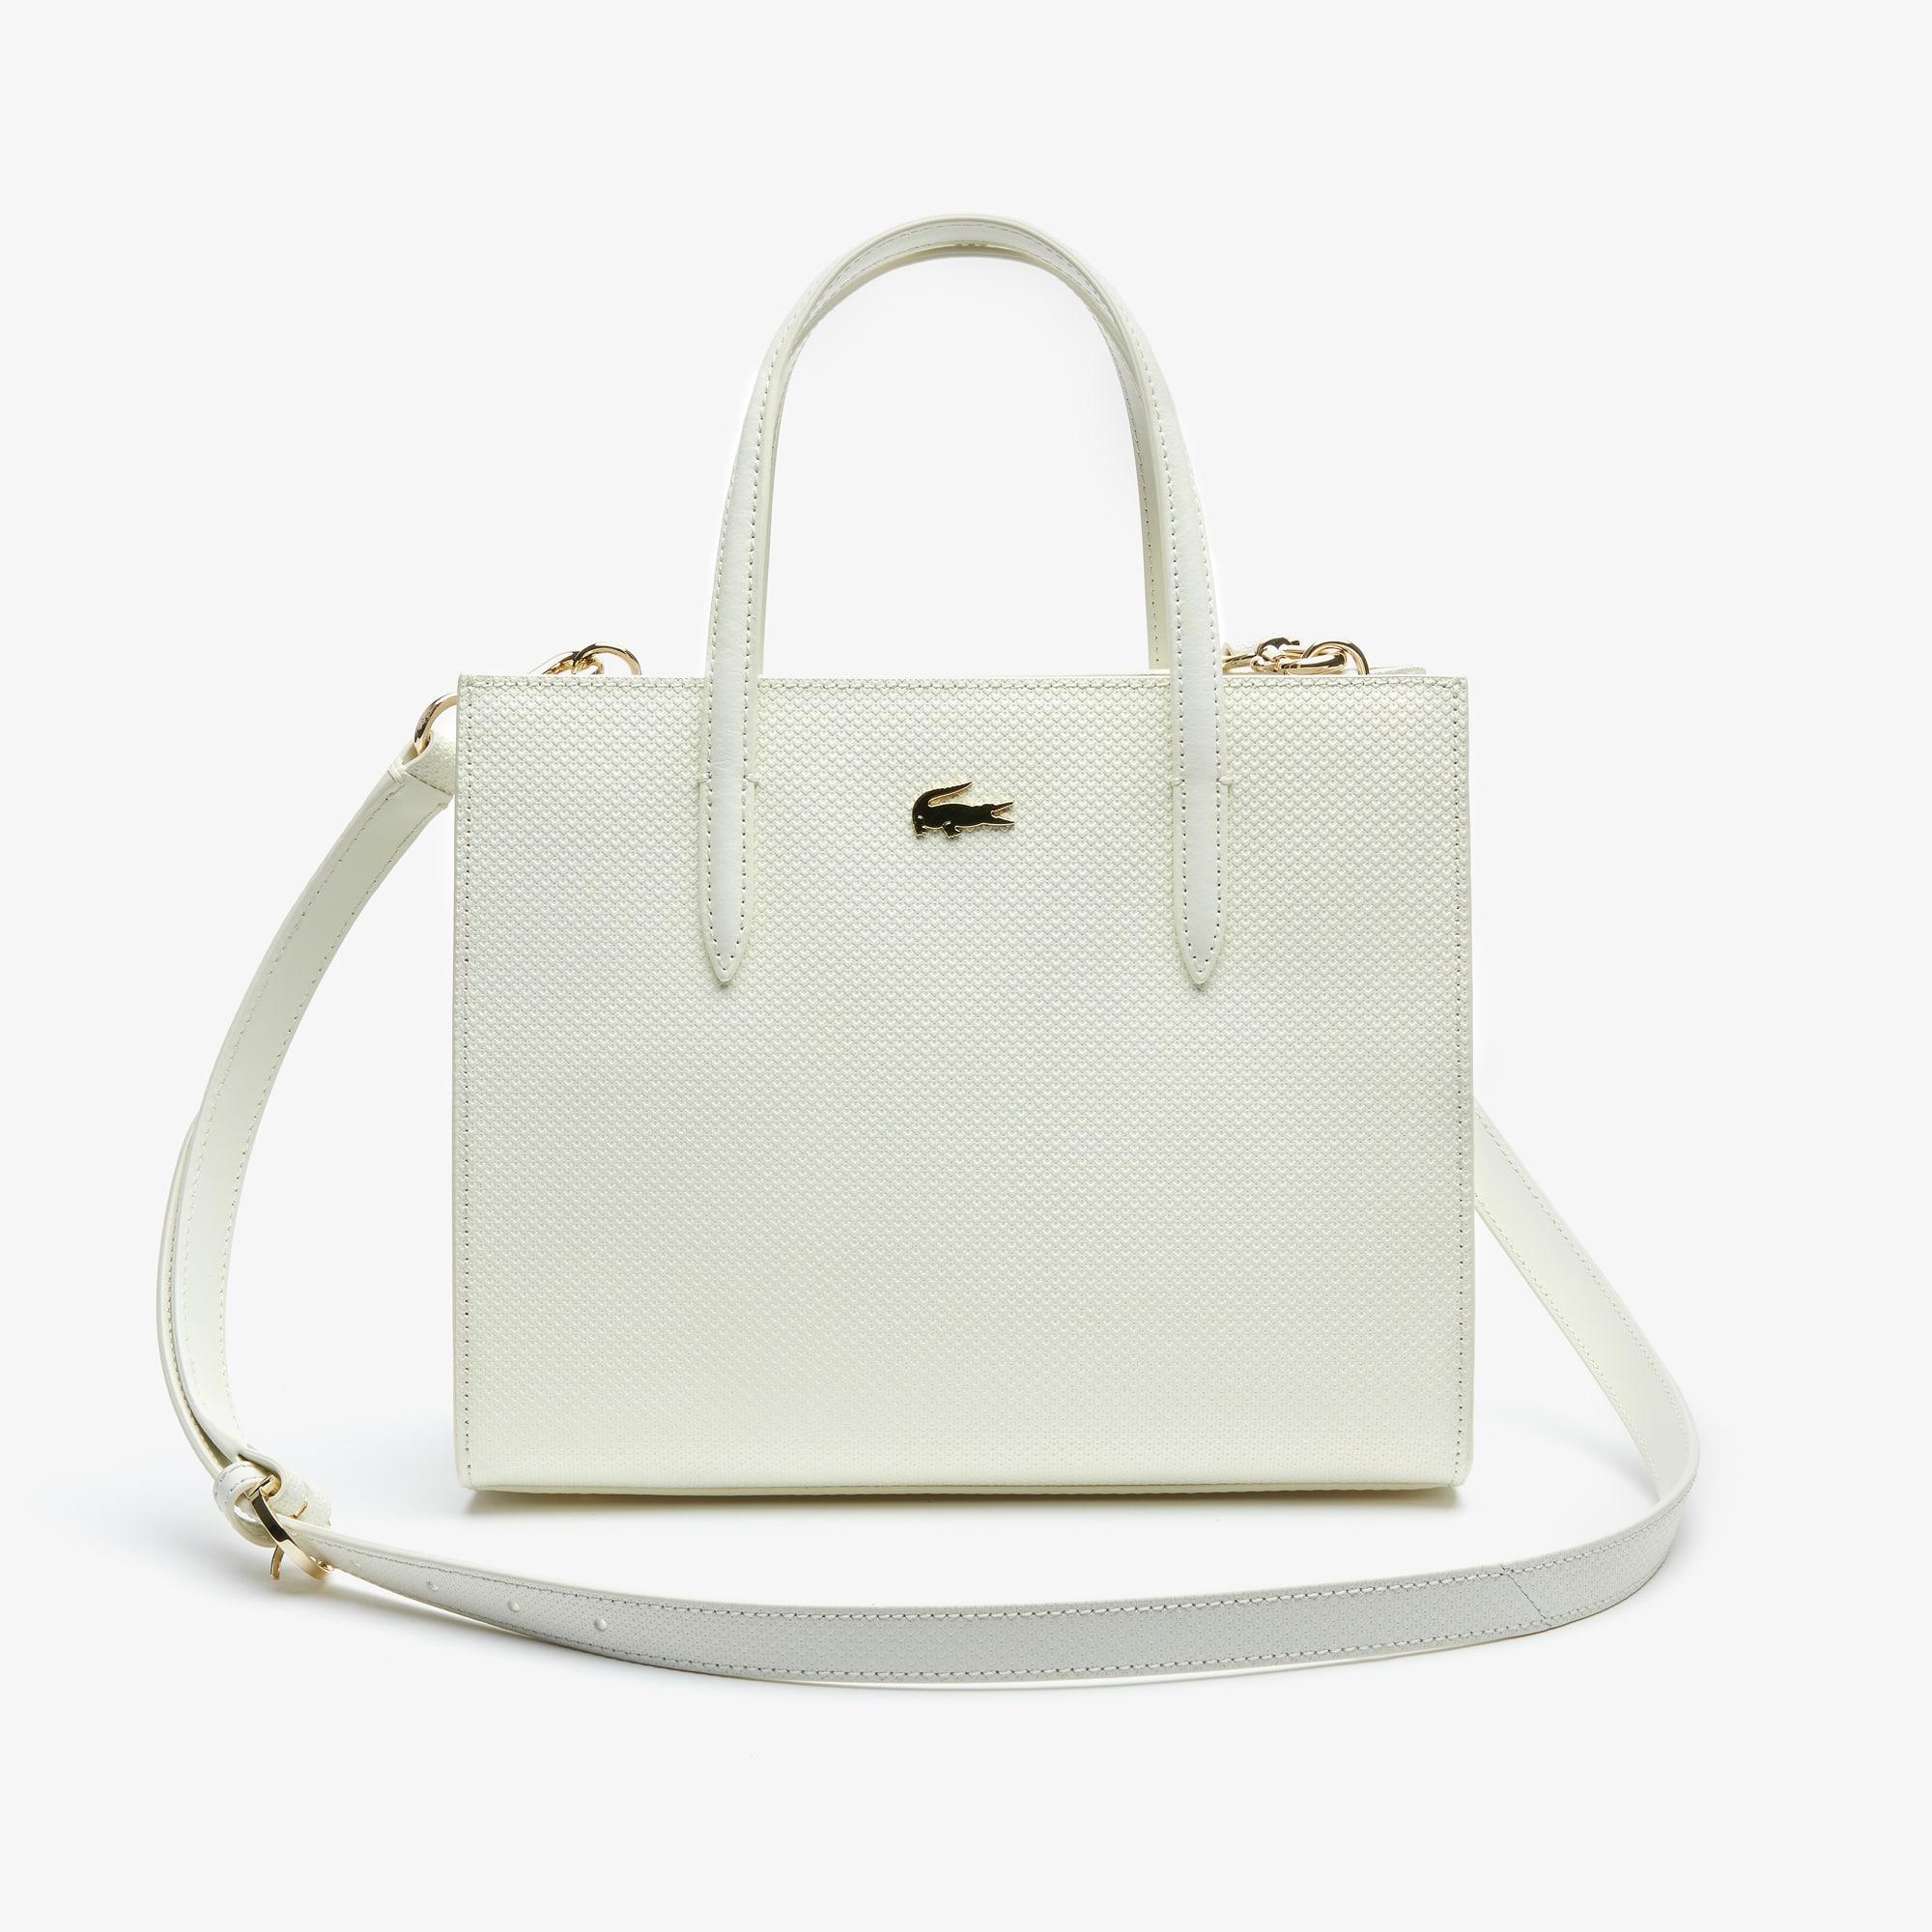 CollectionWomen's Leather Bagsamp; Lacoste Handbags Goods 35LAc4jqR